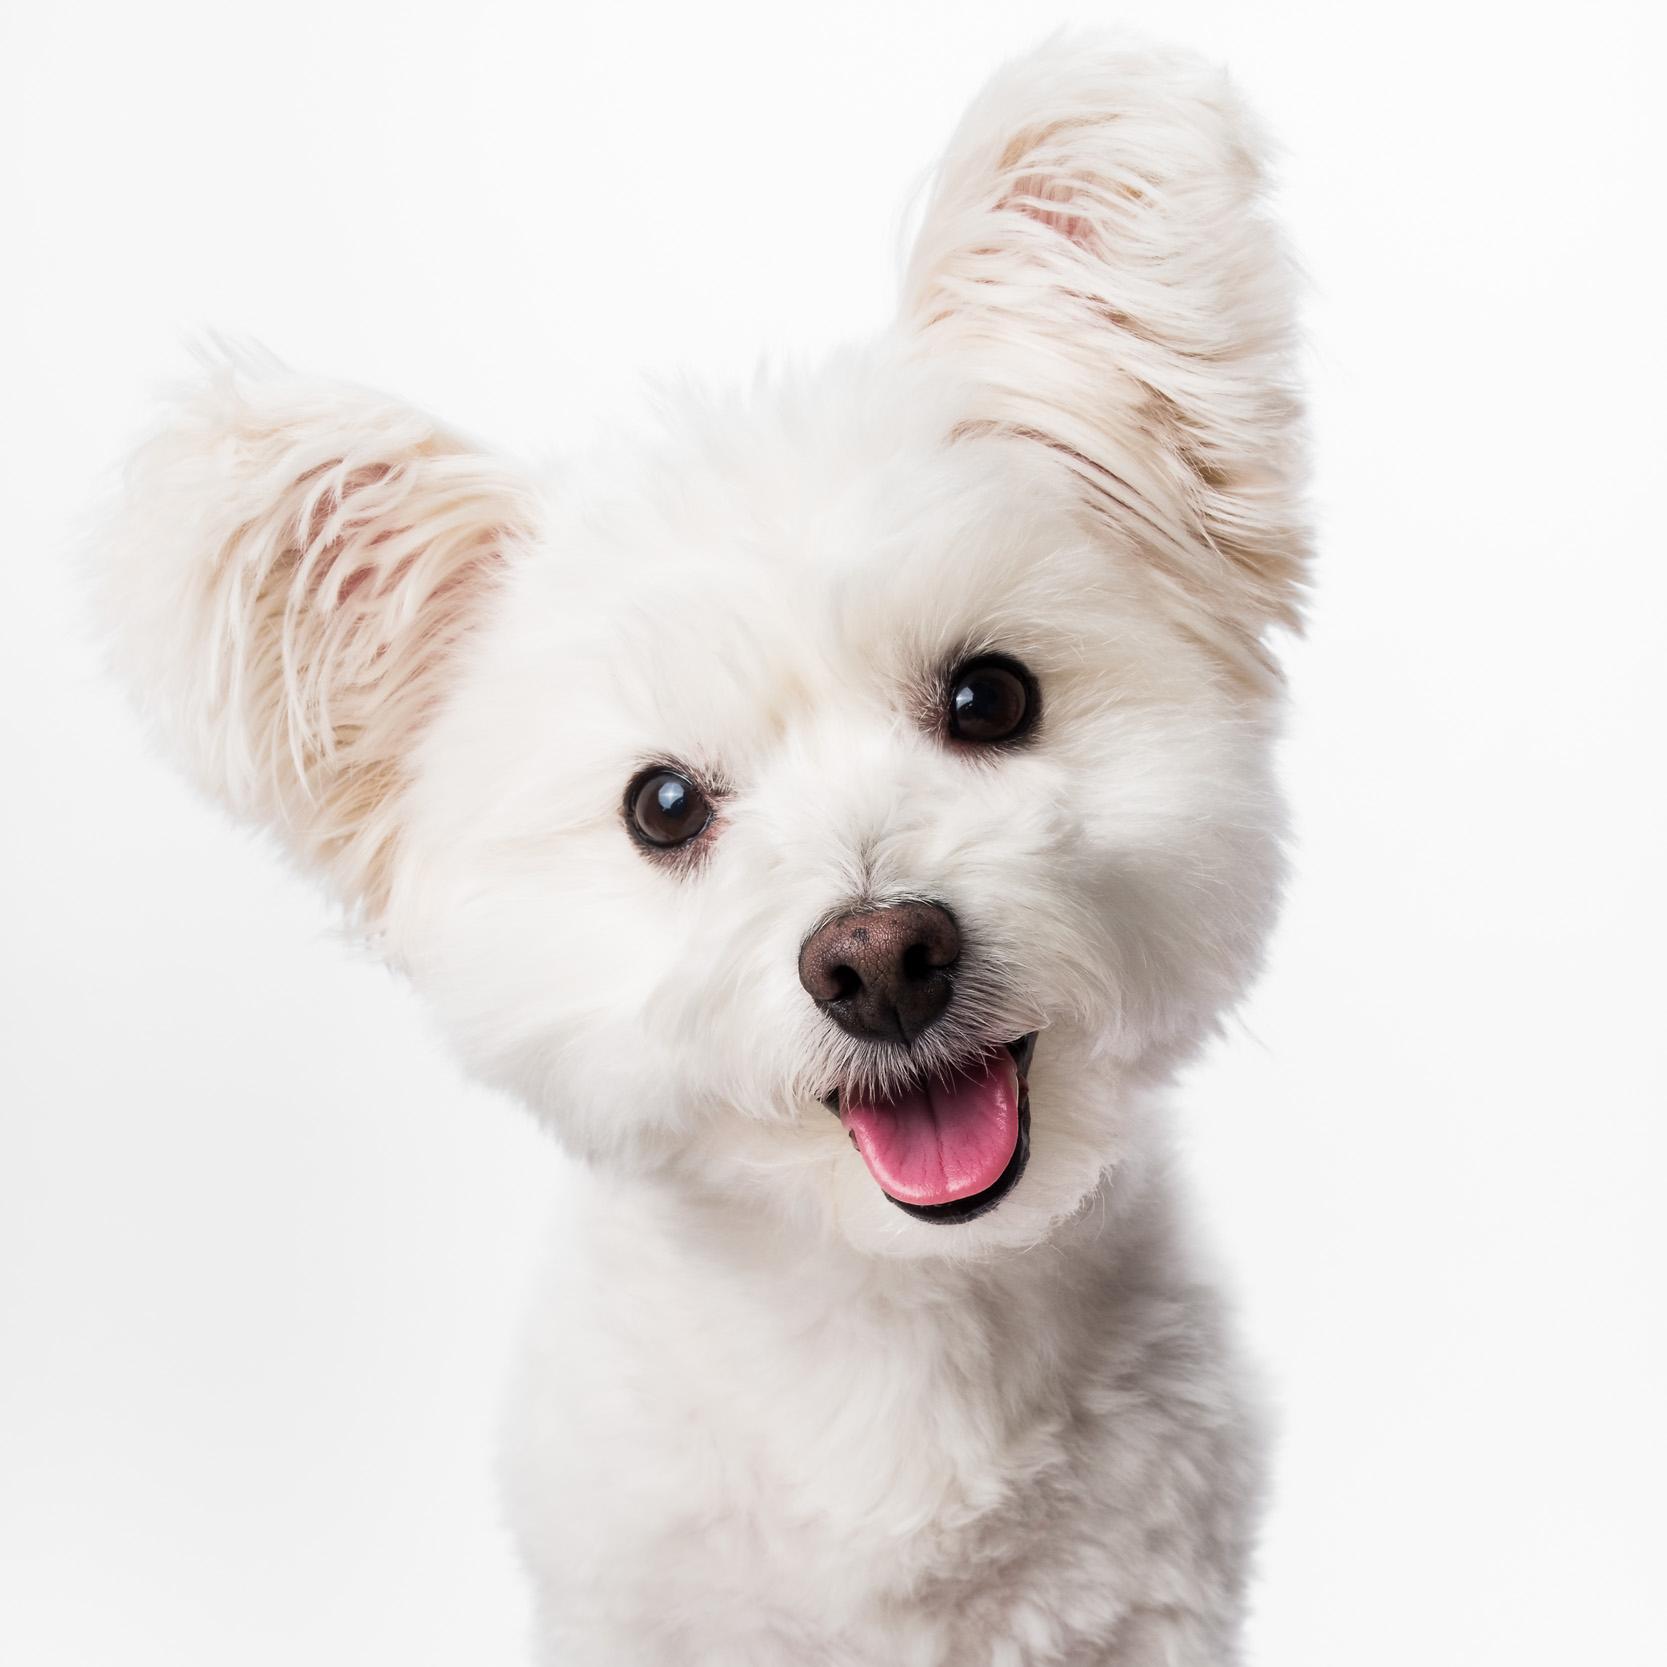 Dog portrait, AMSTAPHY Pet Photography